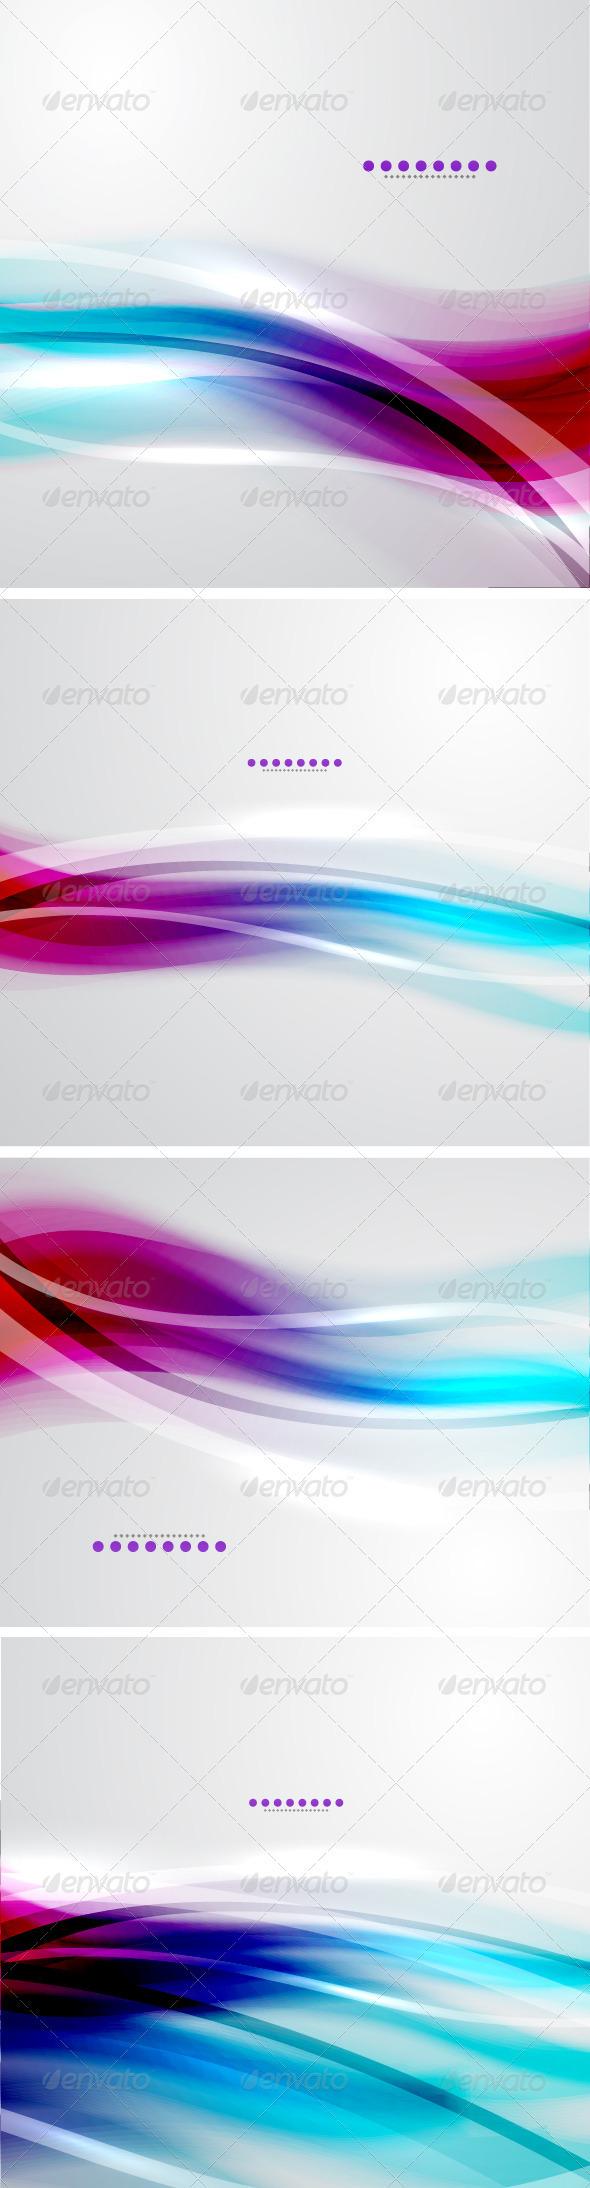 Vector Soft Light Backgrounds - Backgrounds Decorative